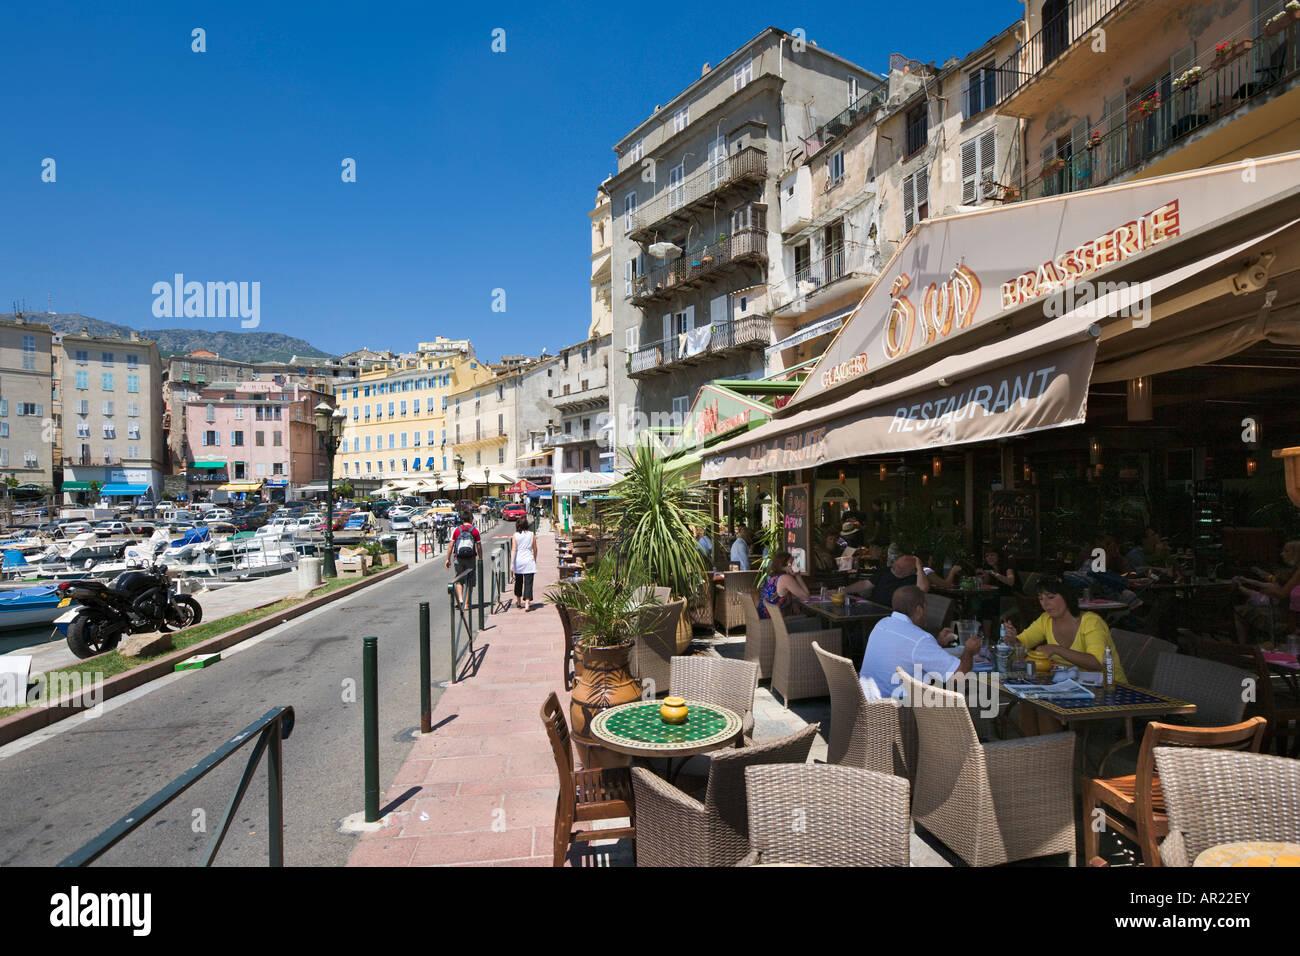 cafe in the vieux port terra vecchia bastia corsica stock photo royalty free image